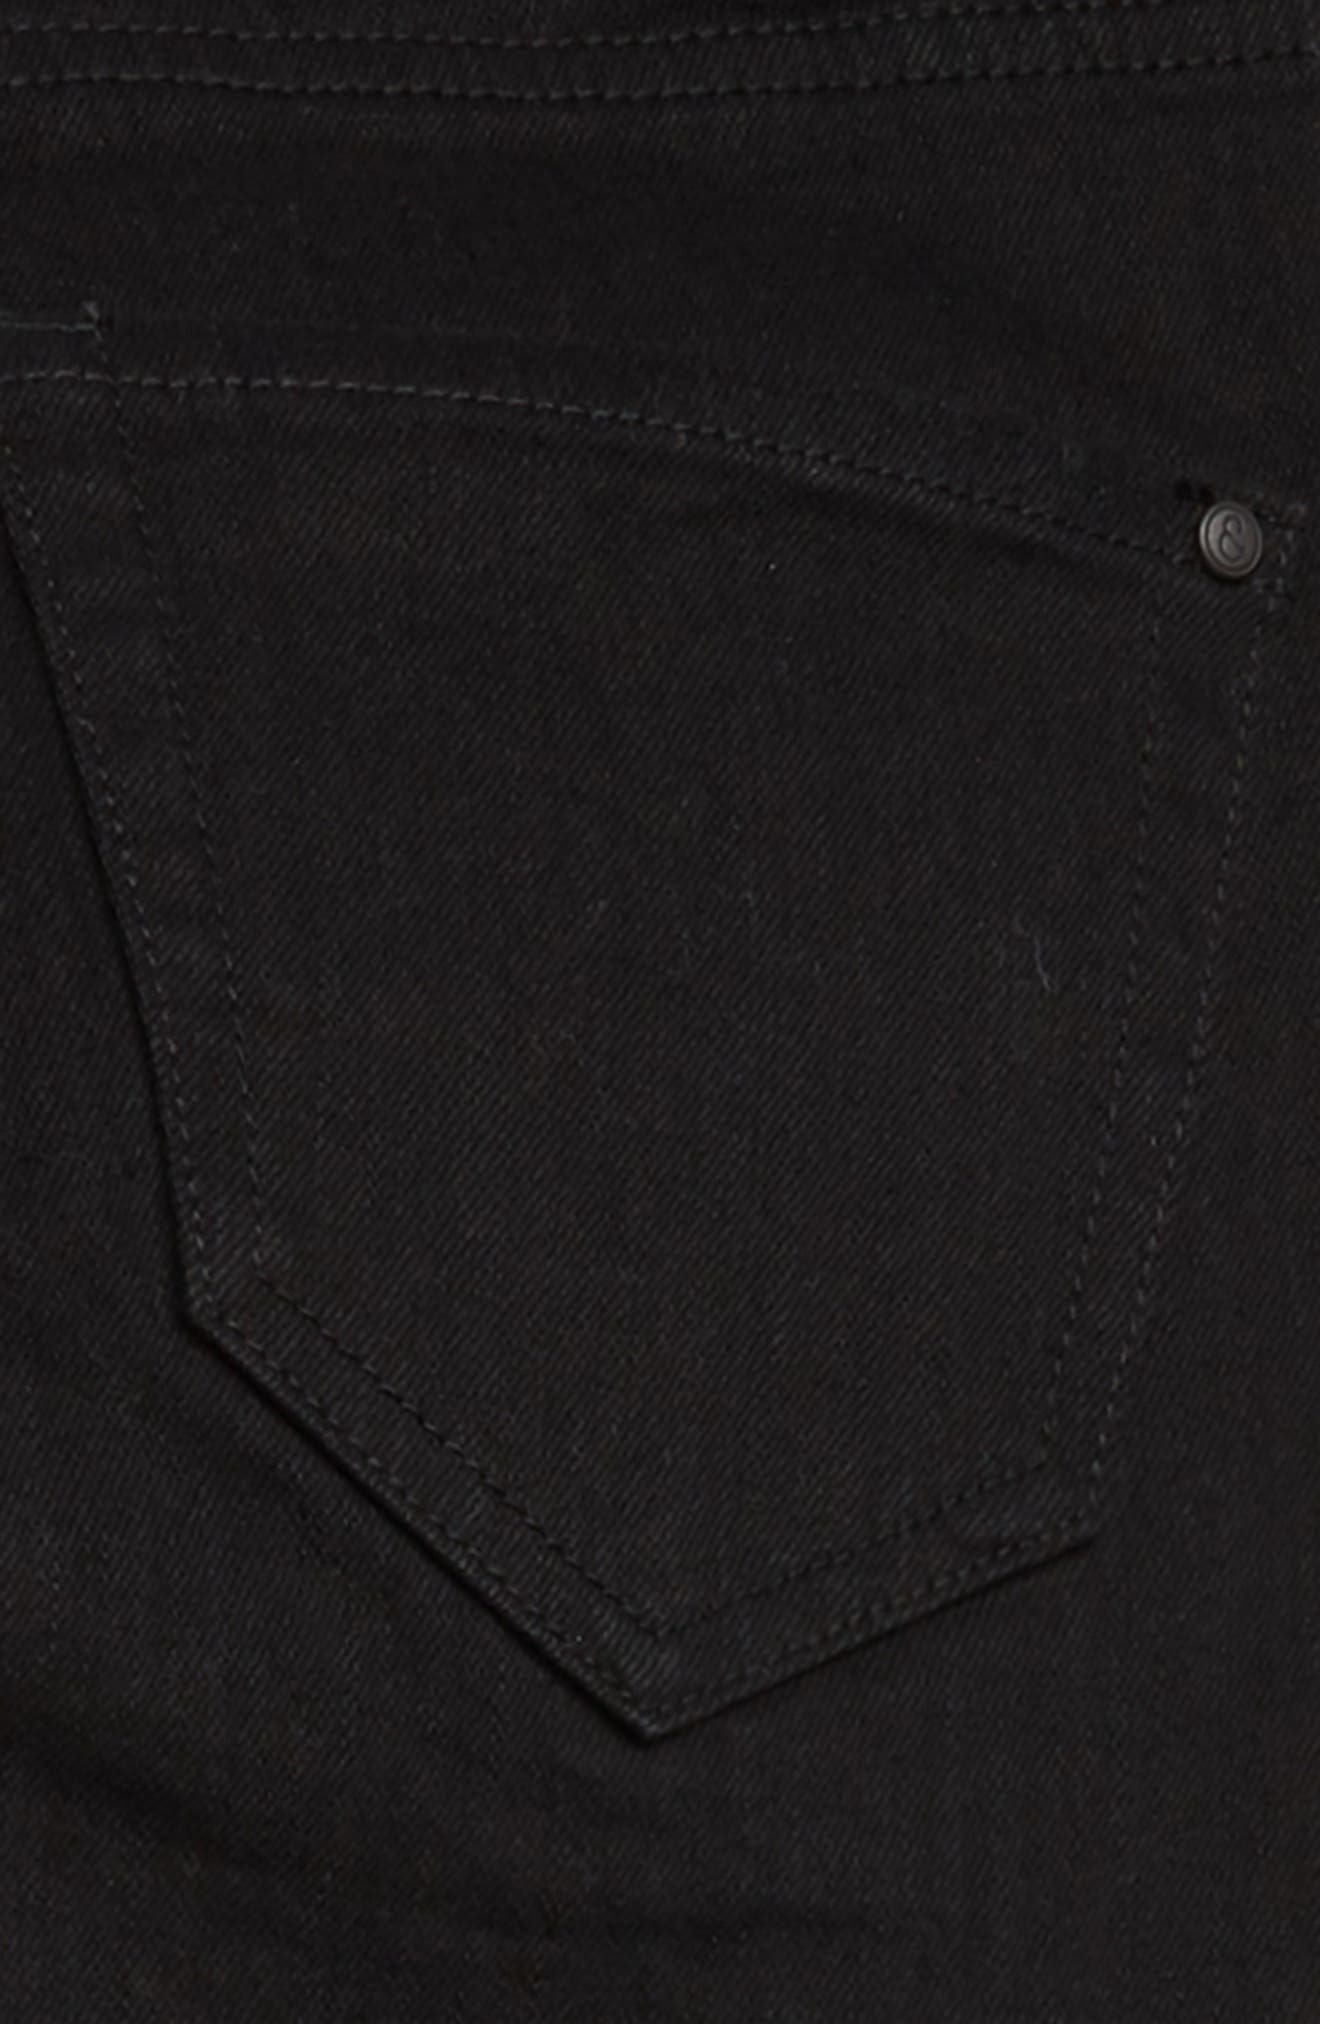 Skinny Jeans,                             Alternate thumbnail 3, color,                             EASY BLACK WASH